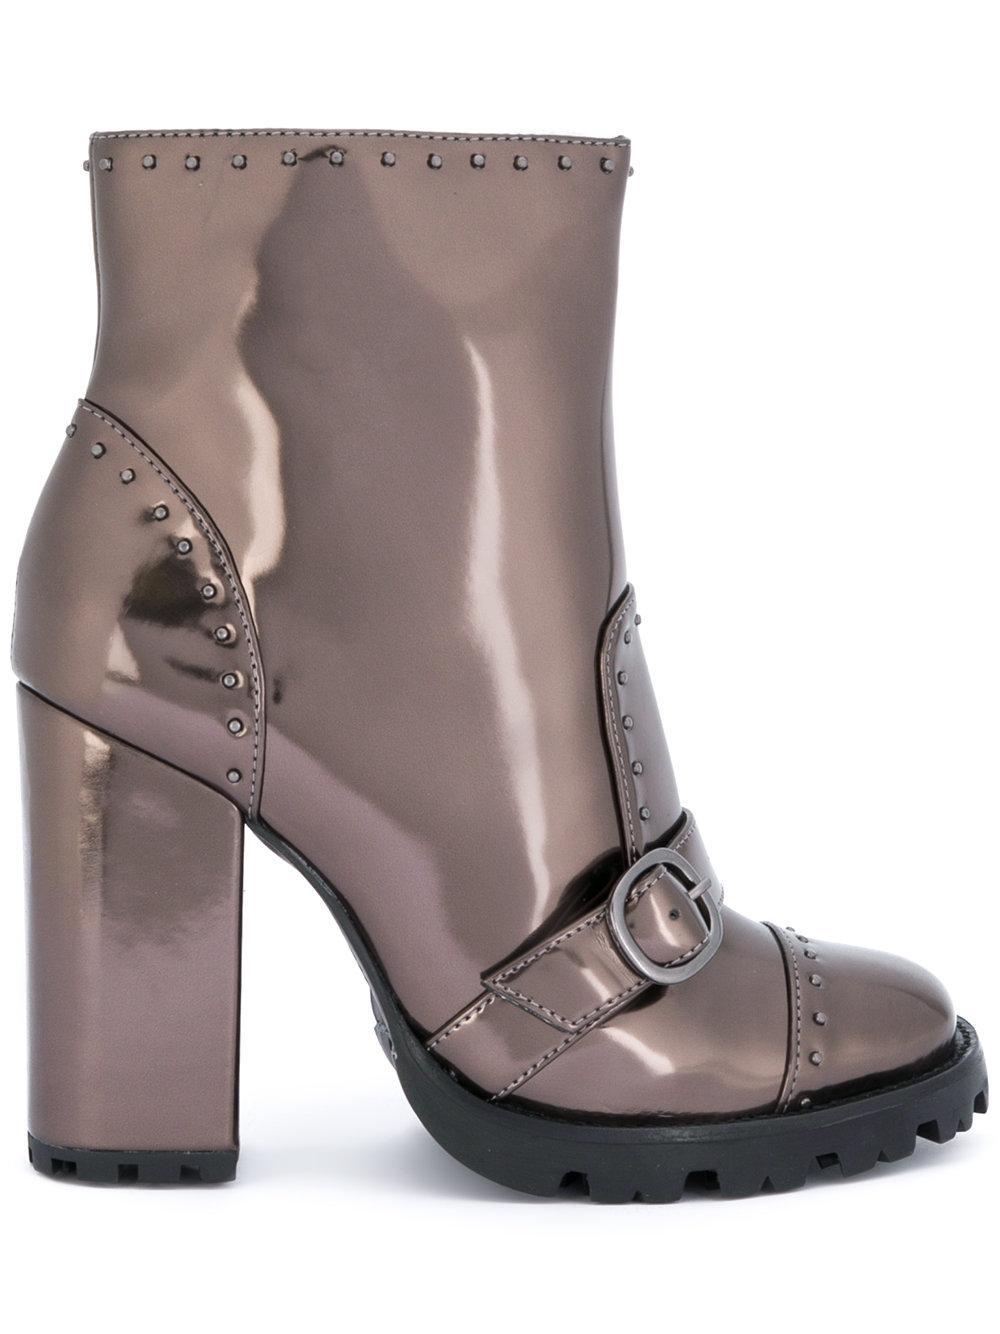 Schutz Studded shiny boots Outlet Websites Best Cheap Online Cheap Visit Discount Sast Buy Cheap Huge Surprise UYqX8o7i6